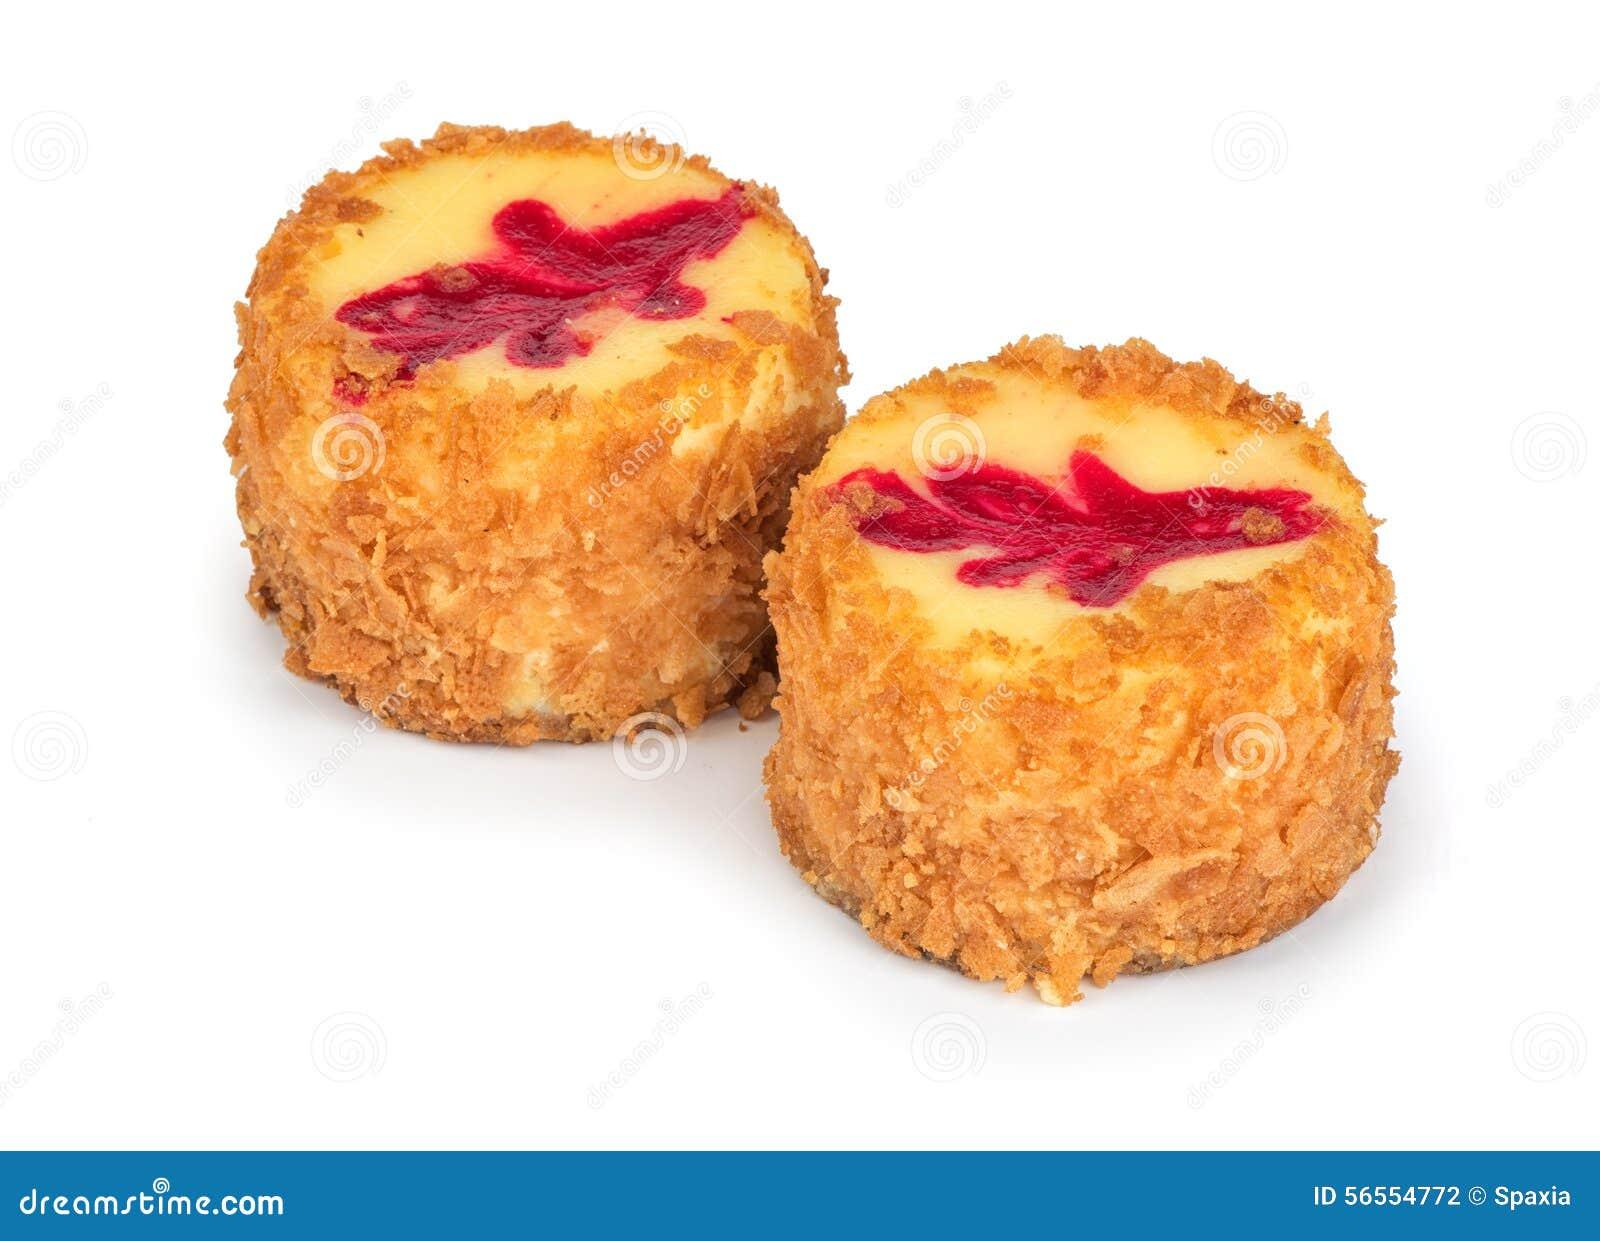 Download εύγευστο λευκό πιάτων μαρμελάδας επιδορπίων κερασιών τυριών κέικ Στοκ Εικόνες - εικόνα από γλυκός, επιδόρπιο: 56554772